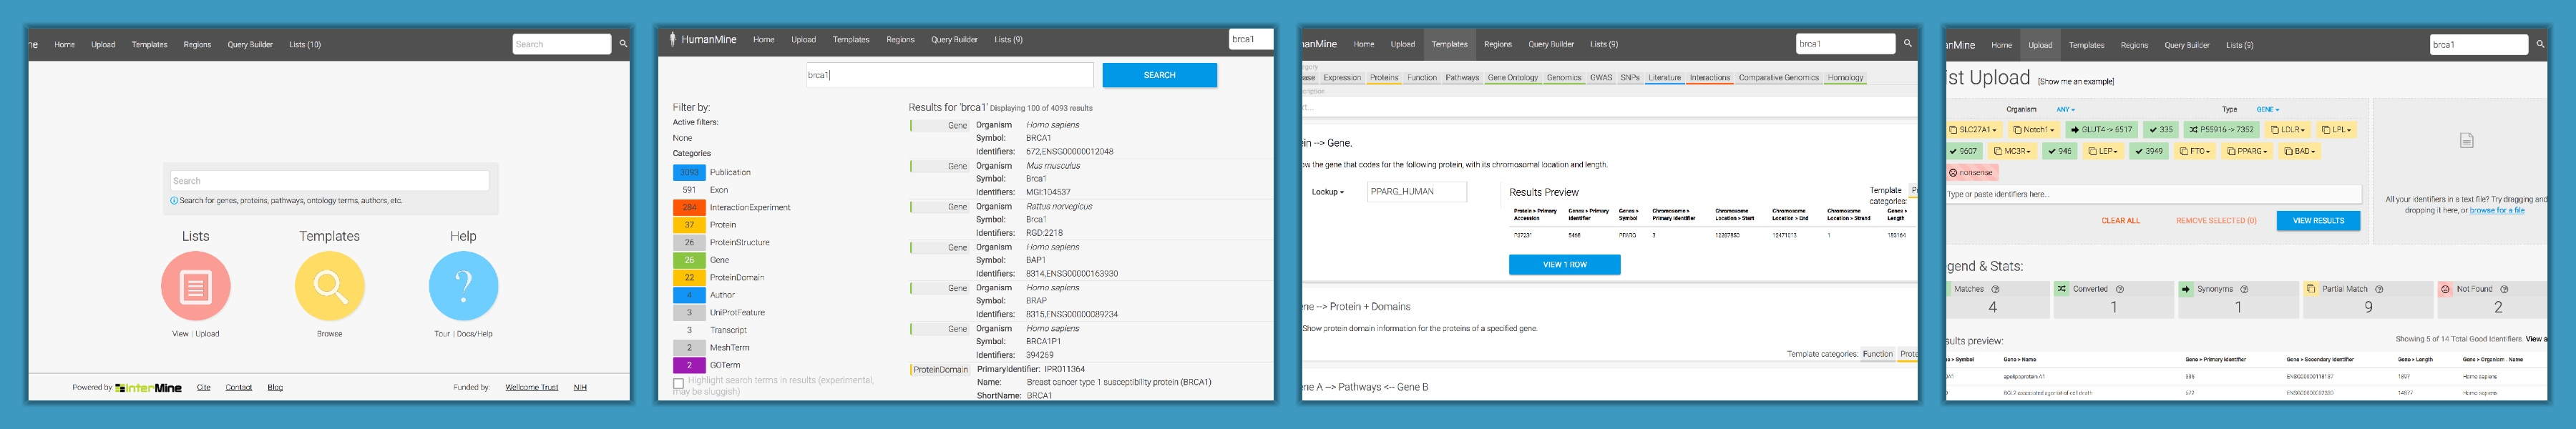 BlueGene screenshots